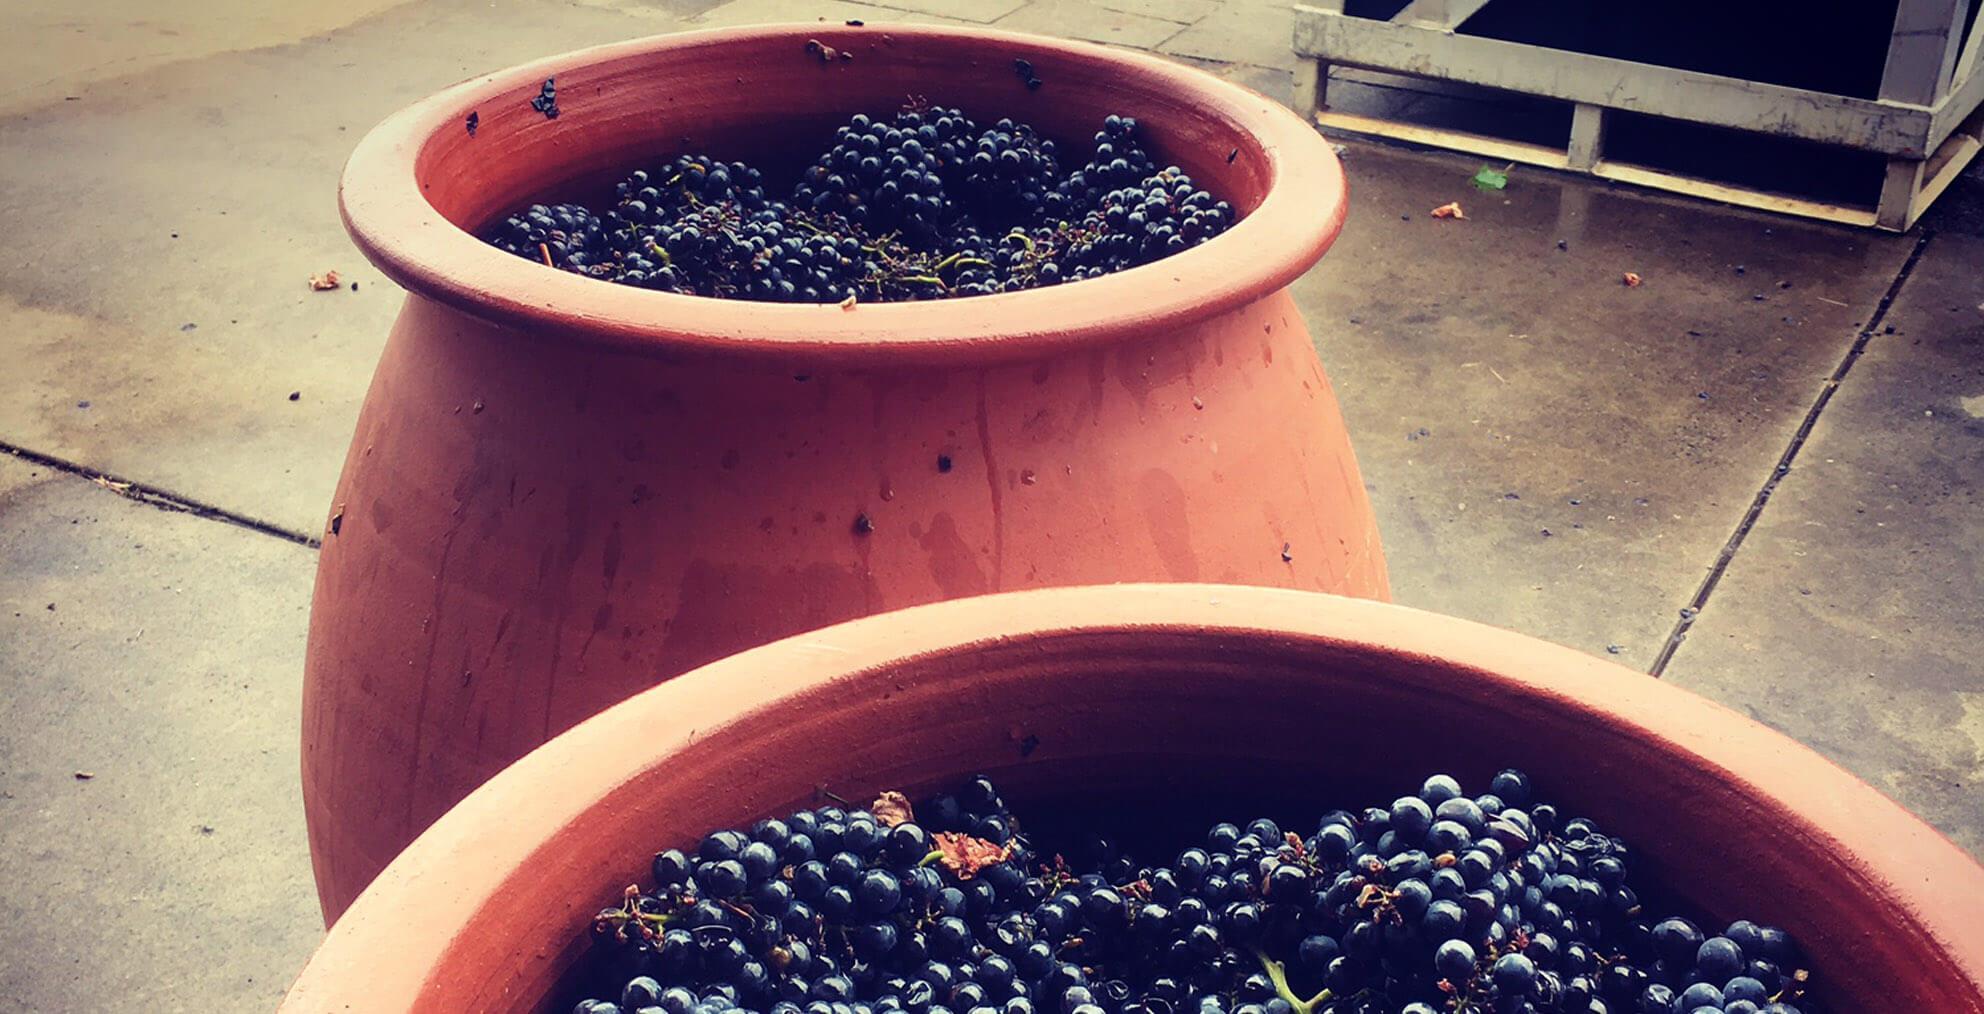 Clay amphorae with grapes  | AMATO VINO